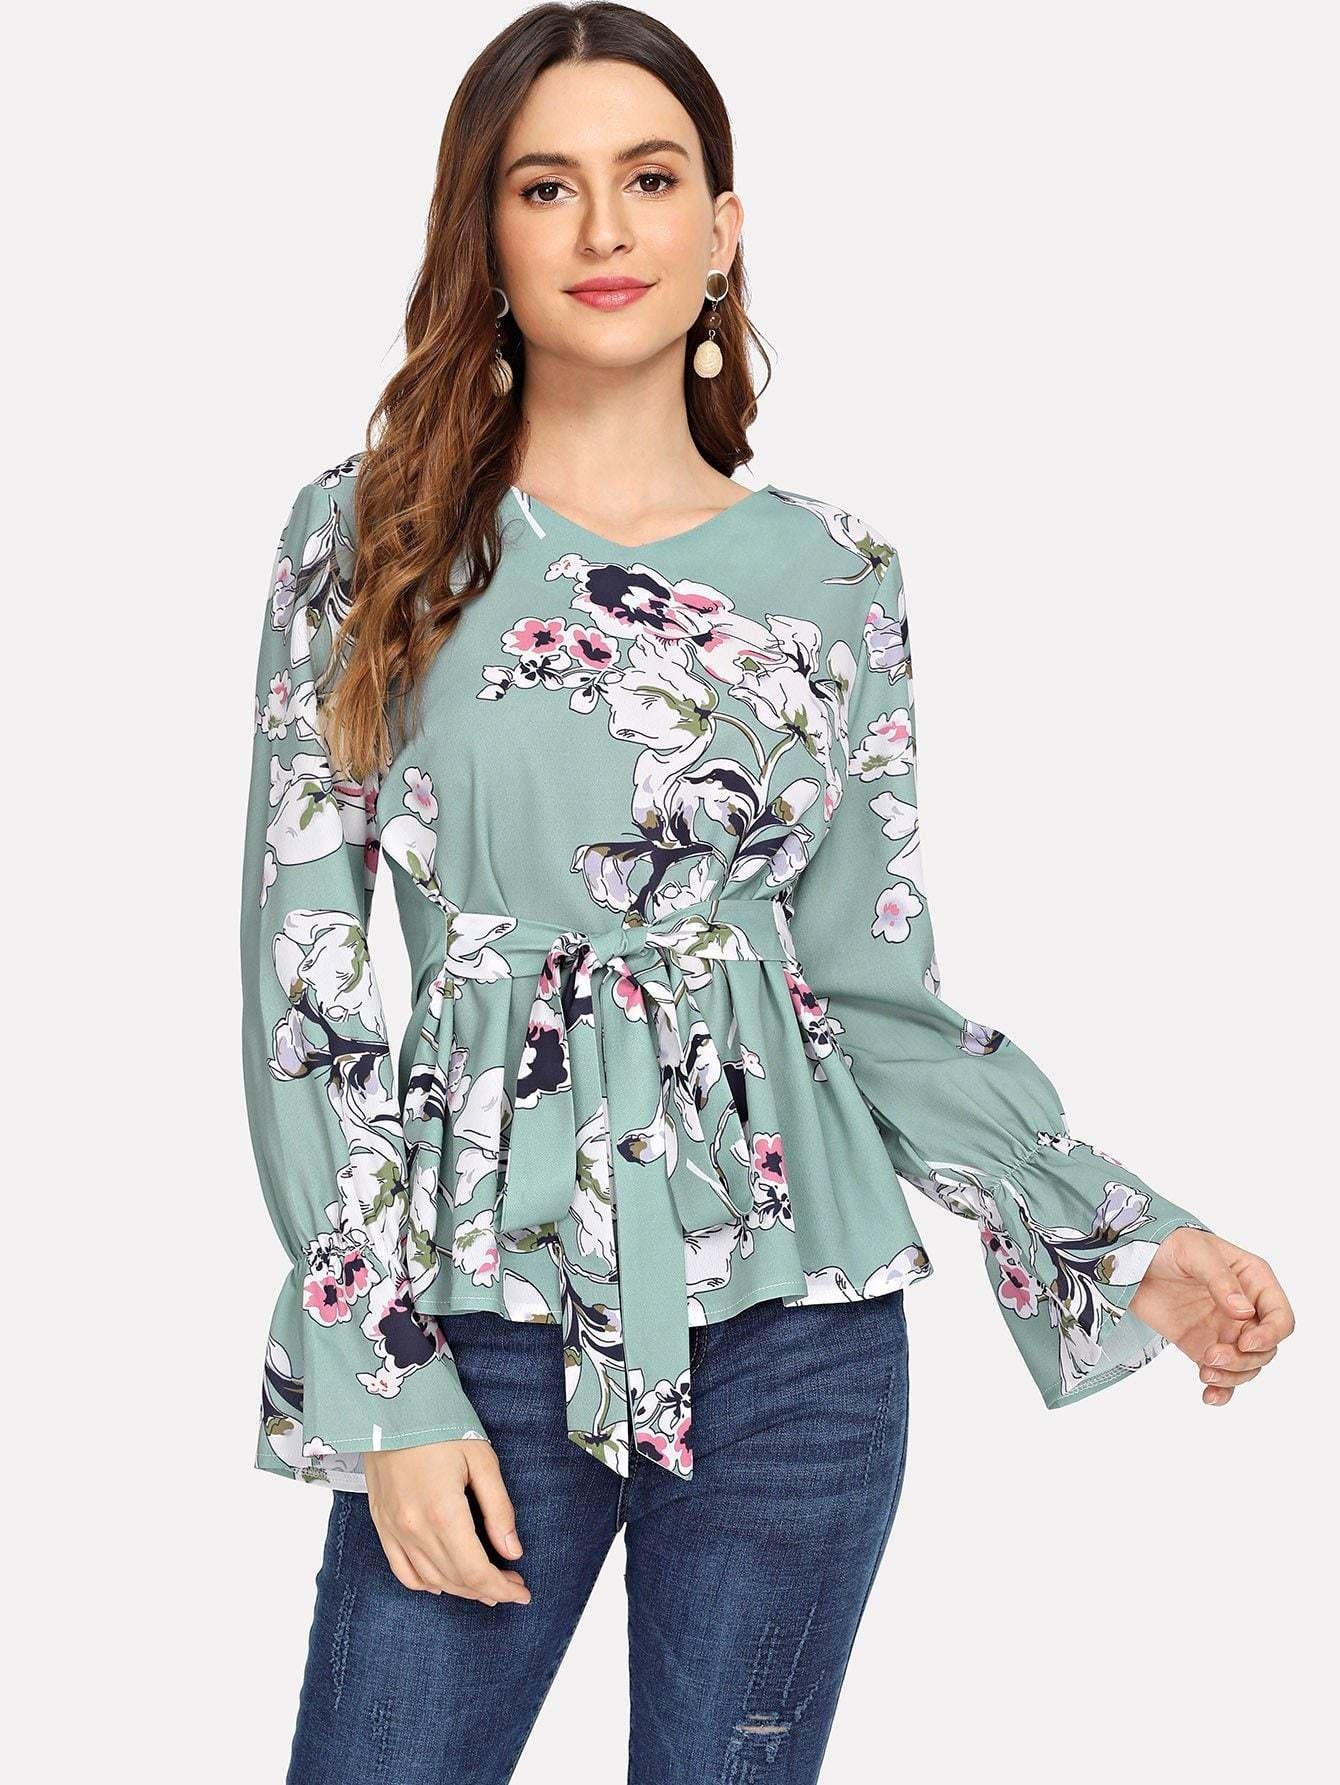 Blue Blouse Floral Print Blouse Short Sleeves Blouse Crinkle Top English Roses Print Cotton Blouse Short Sleeves Summer Jacket  Medium Size